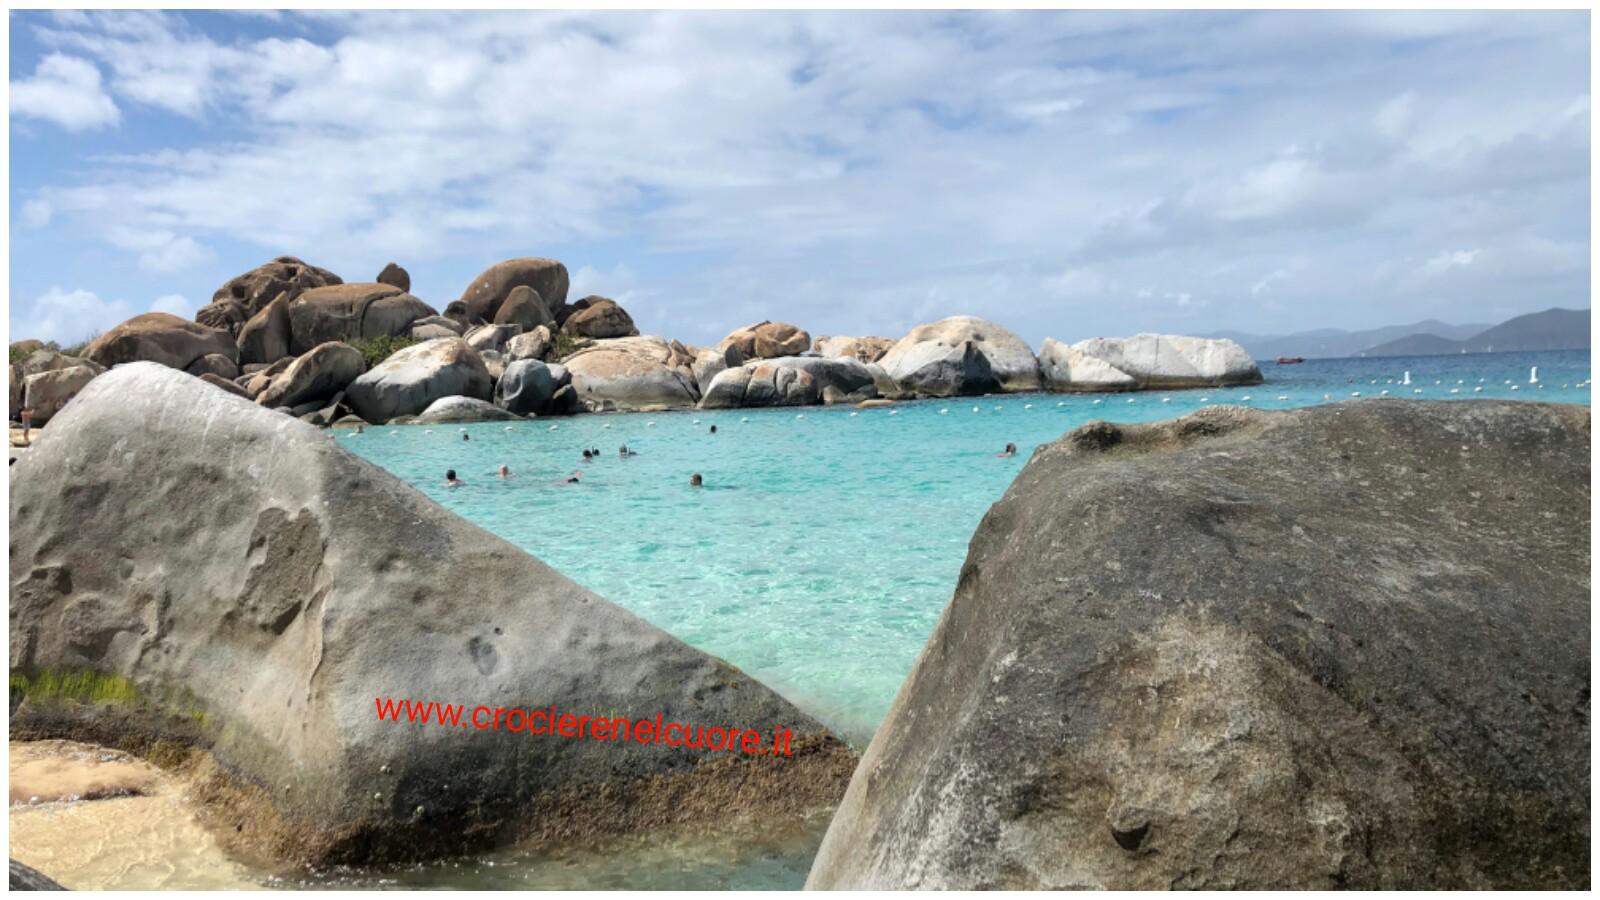 crociere nel cuore - Devil's Bay Virgin Gorda Tortola